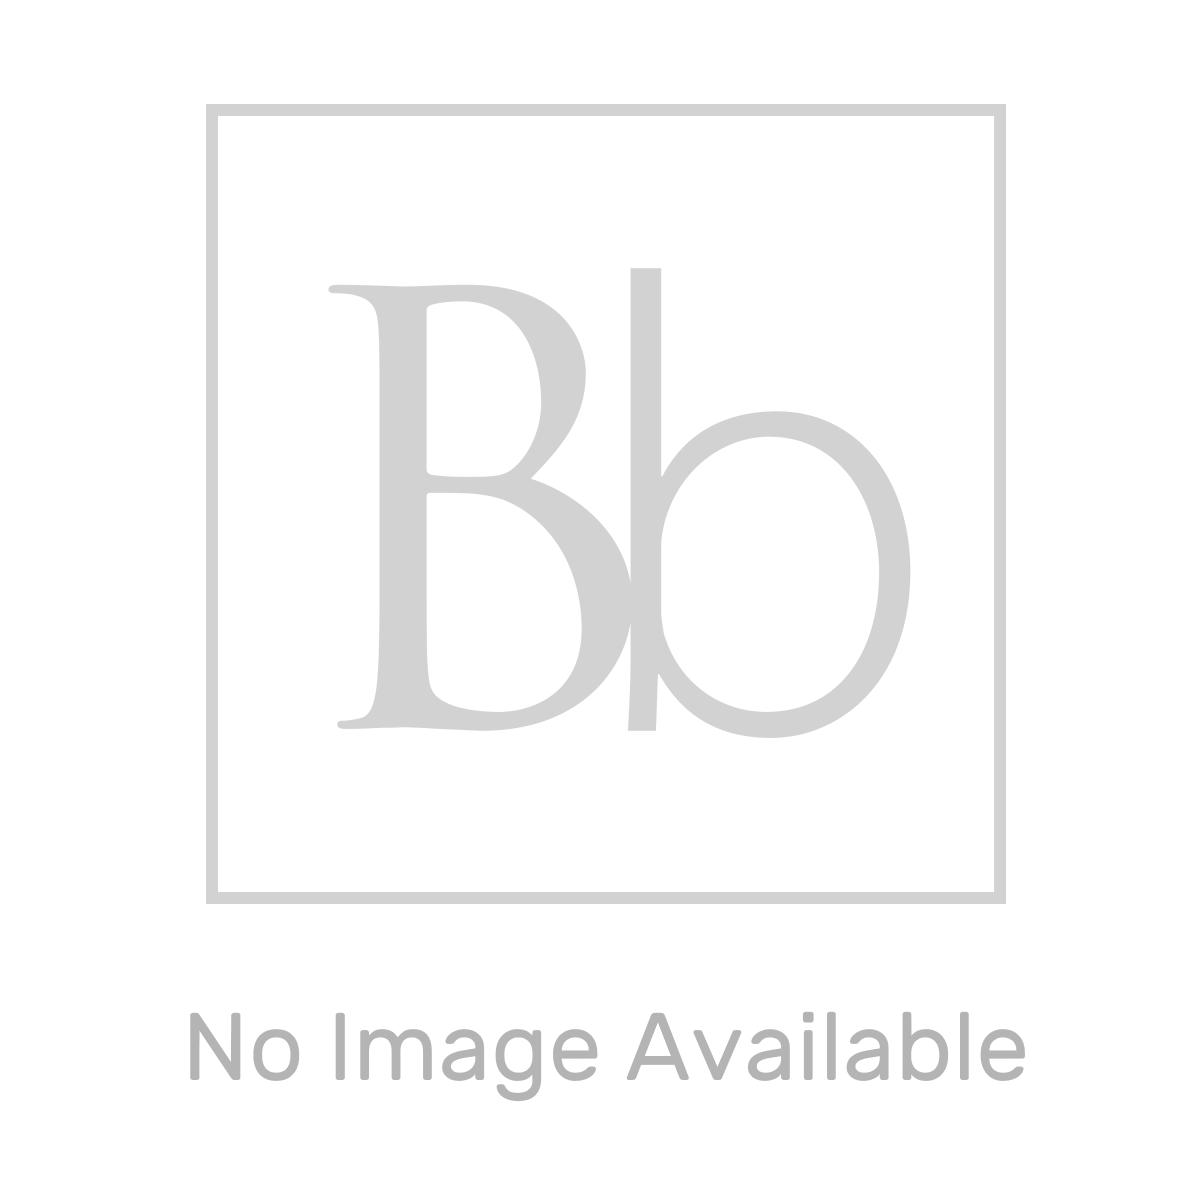 Aquadart Black Slate Shower Tray 1100 x 800